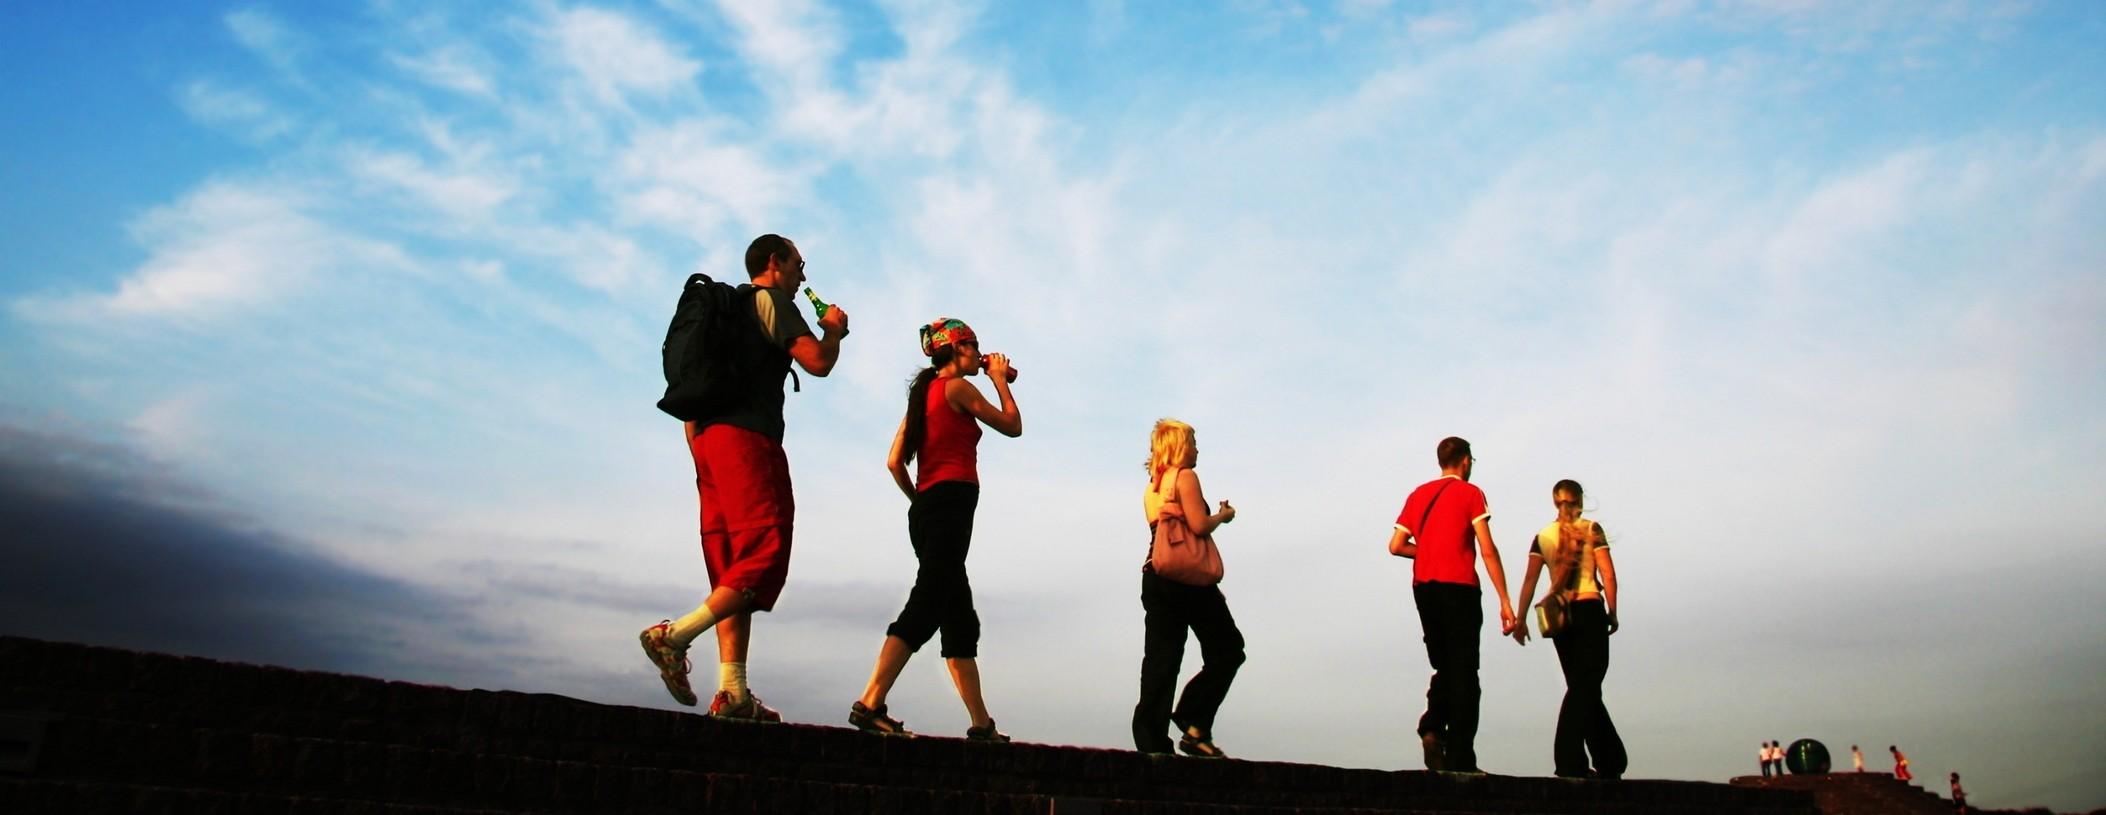 walking e non jogging per dimagrire